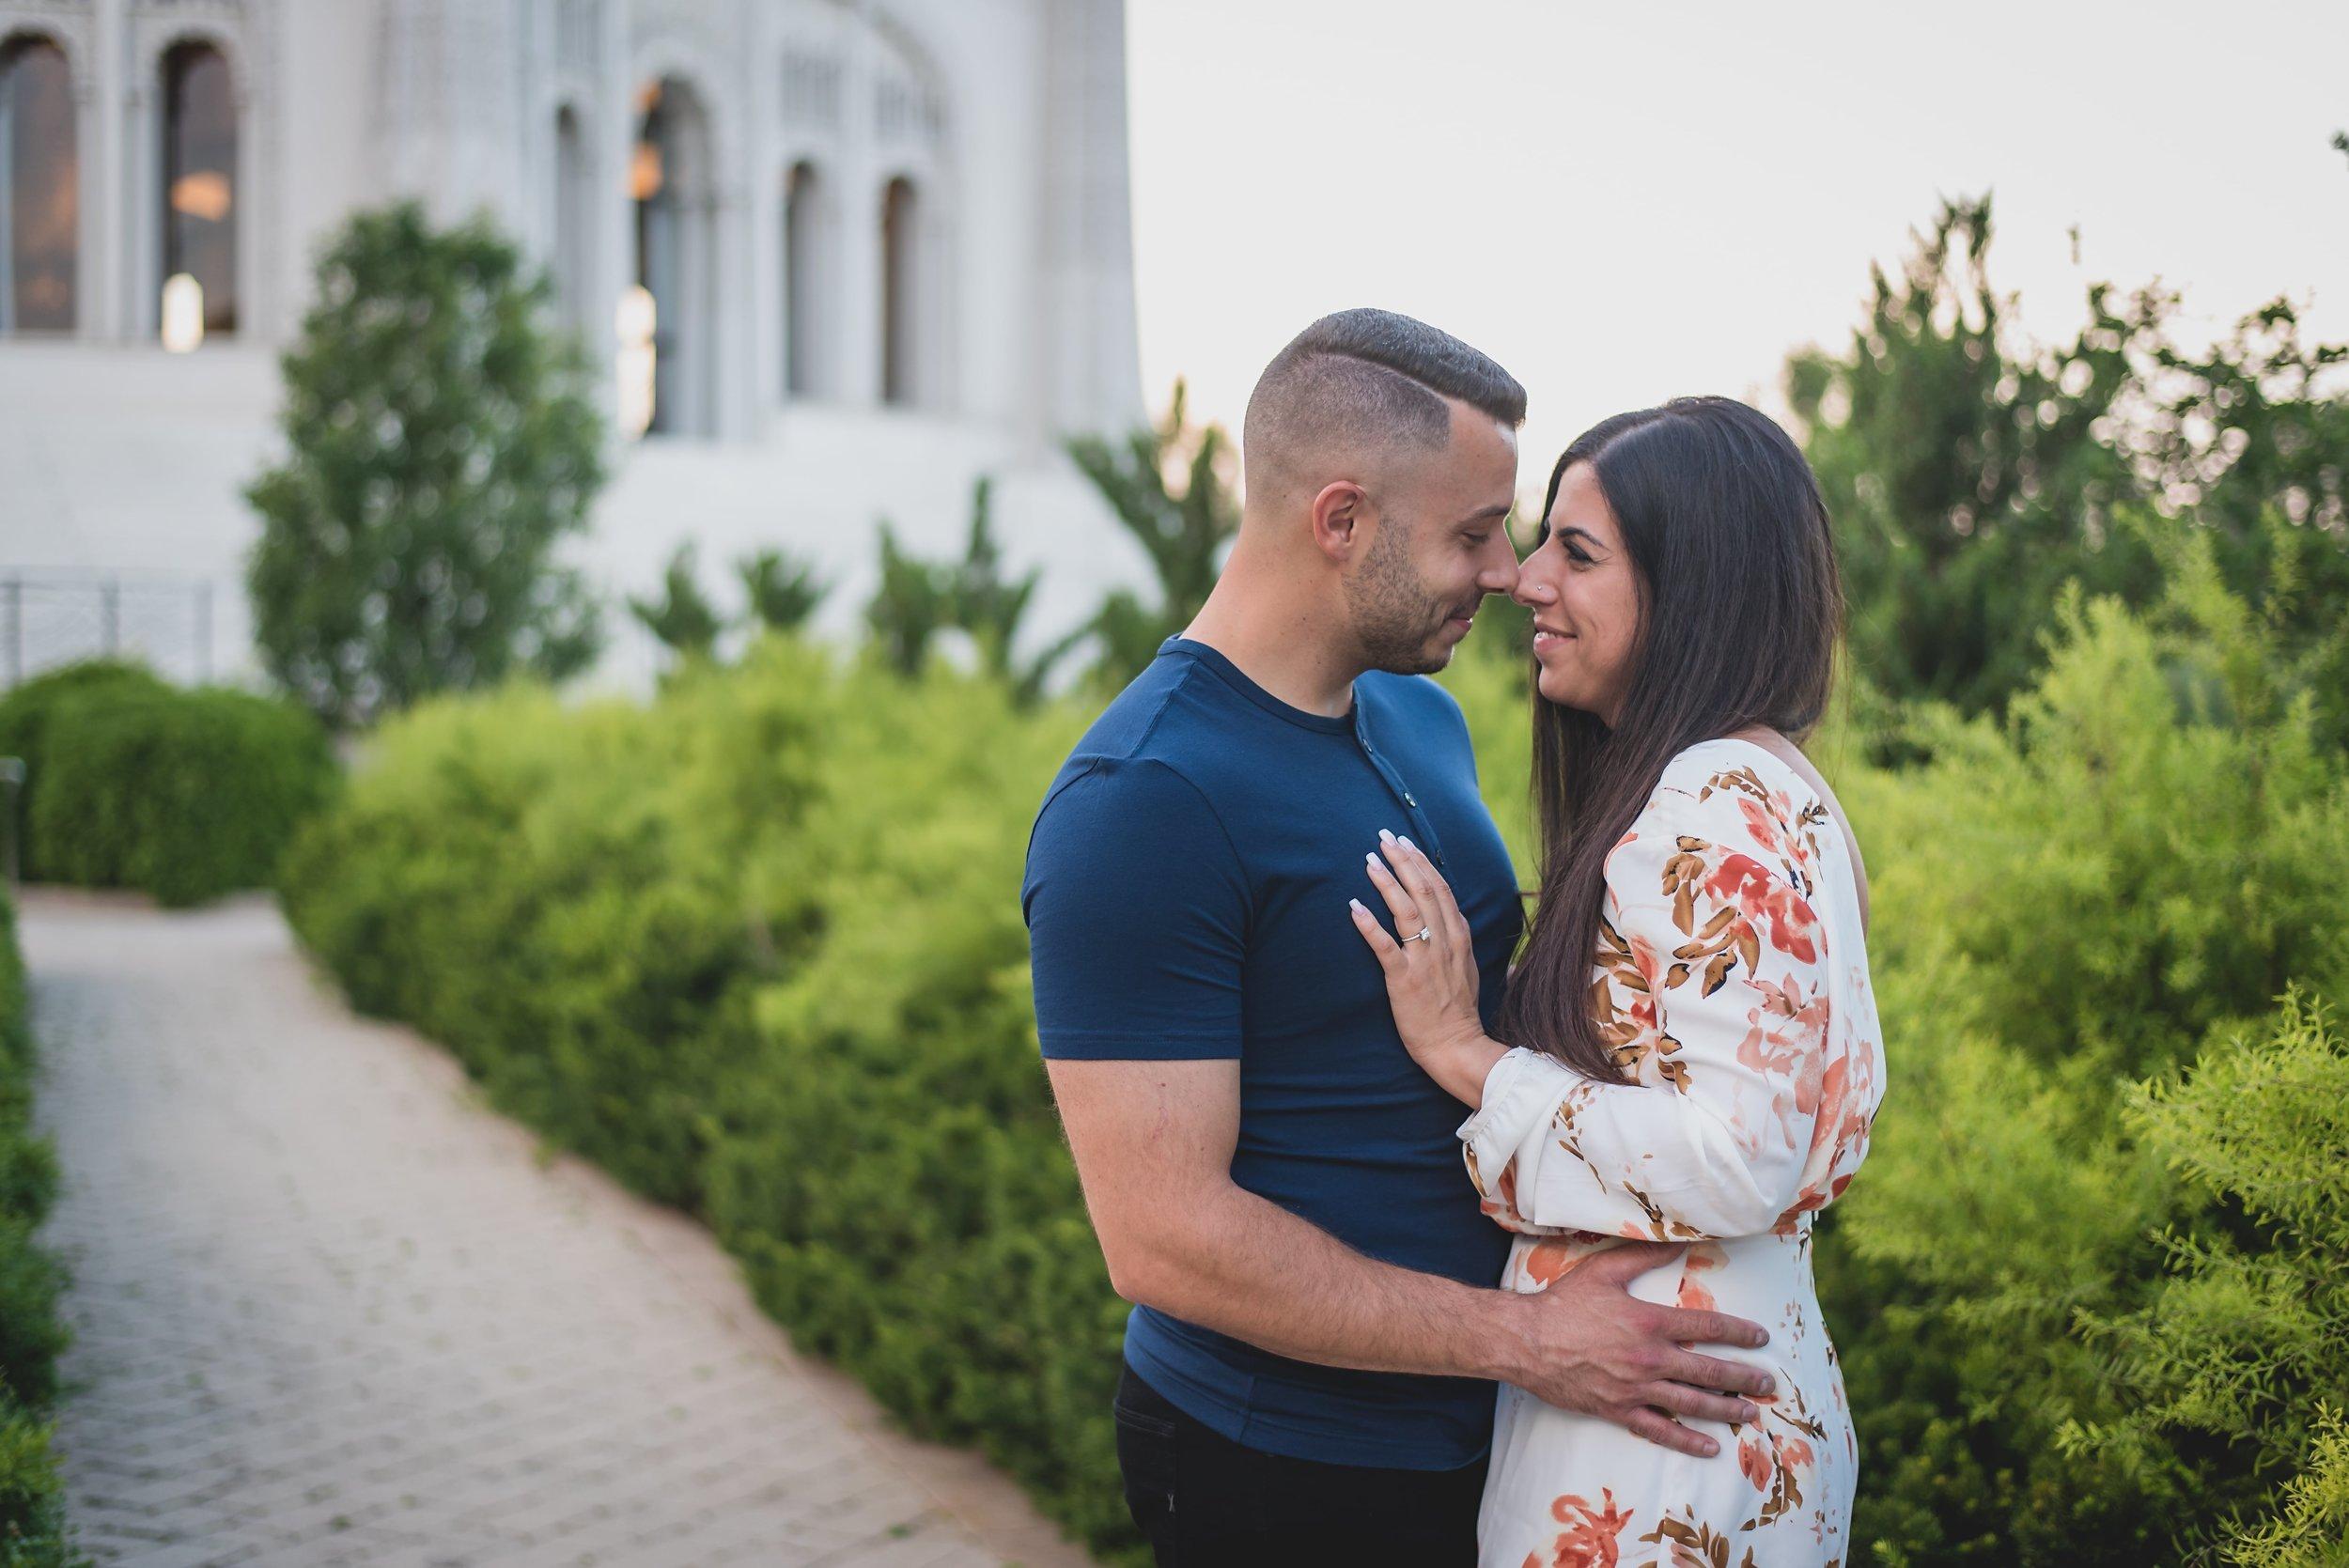 Engaged couple on stone pathway kissing.